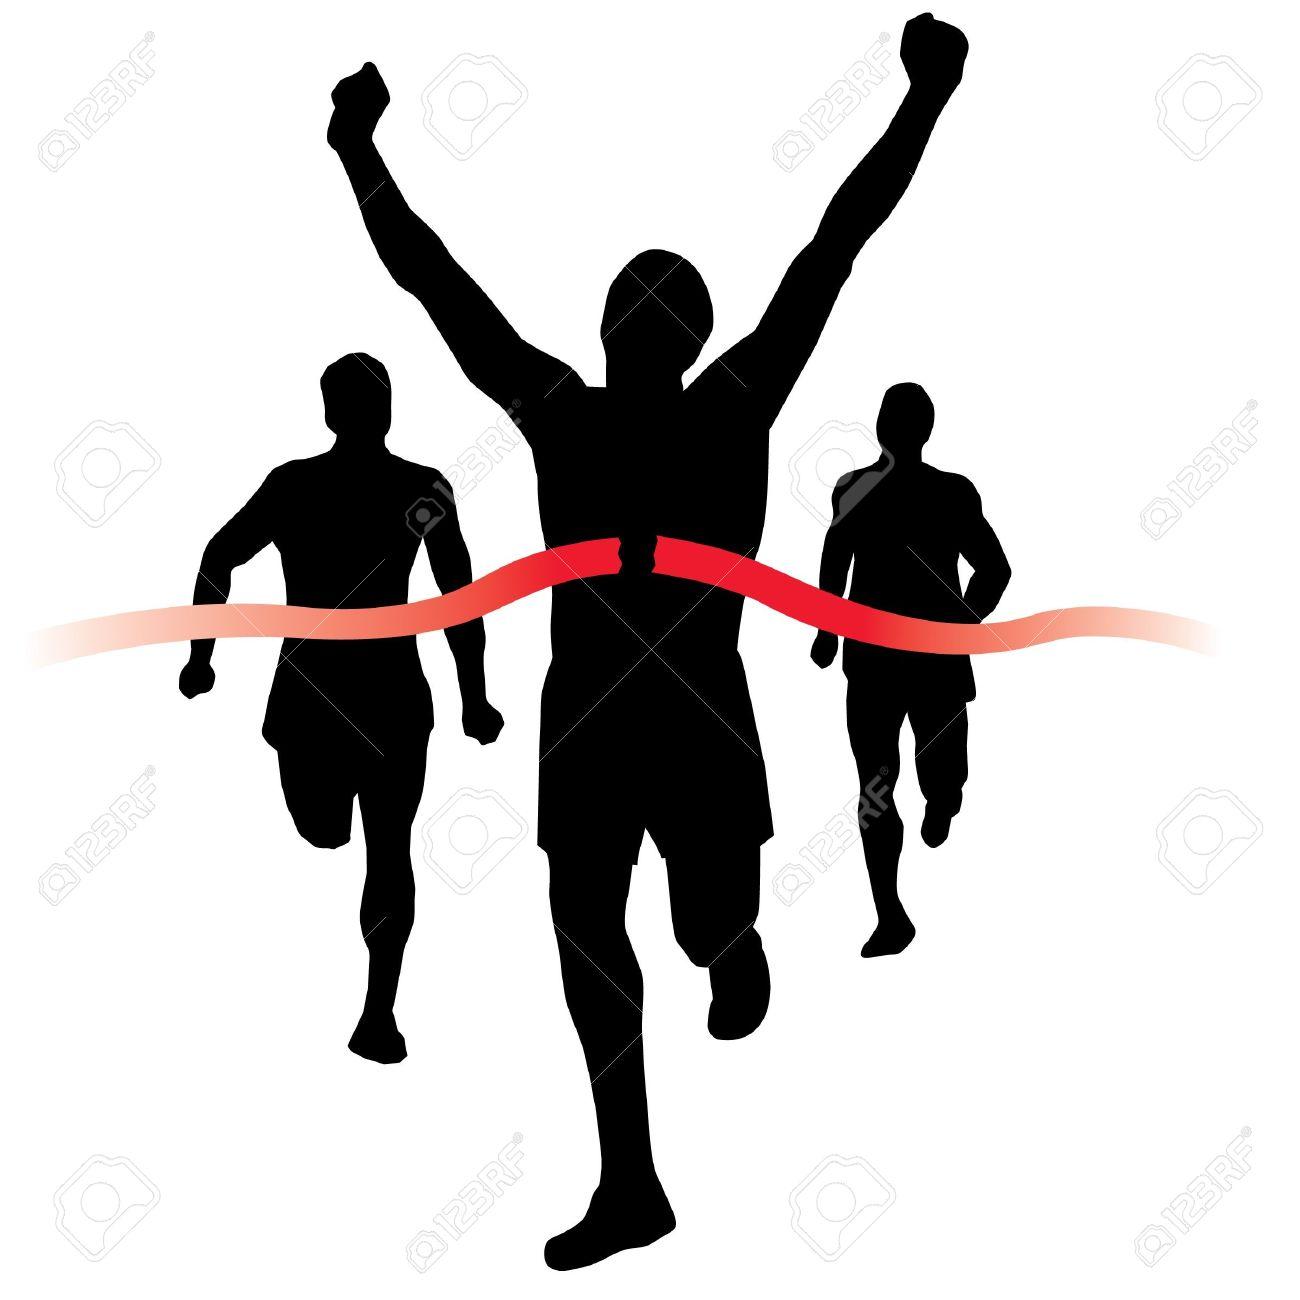 finish line race  Runner wins  Race Clipart Finish Line